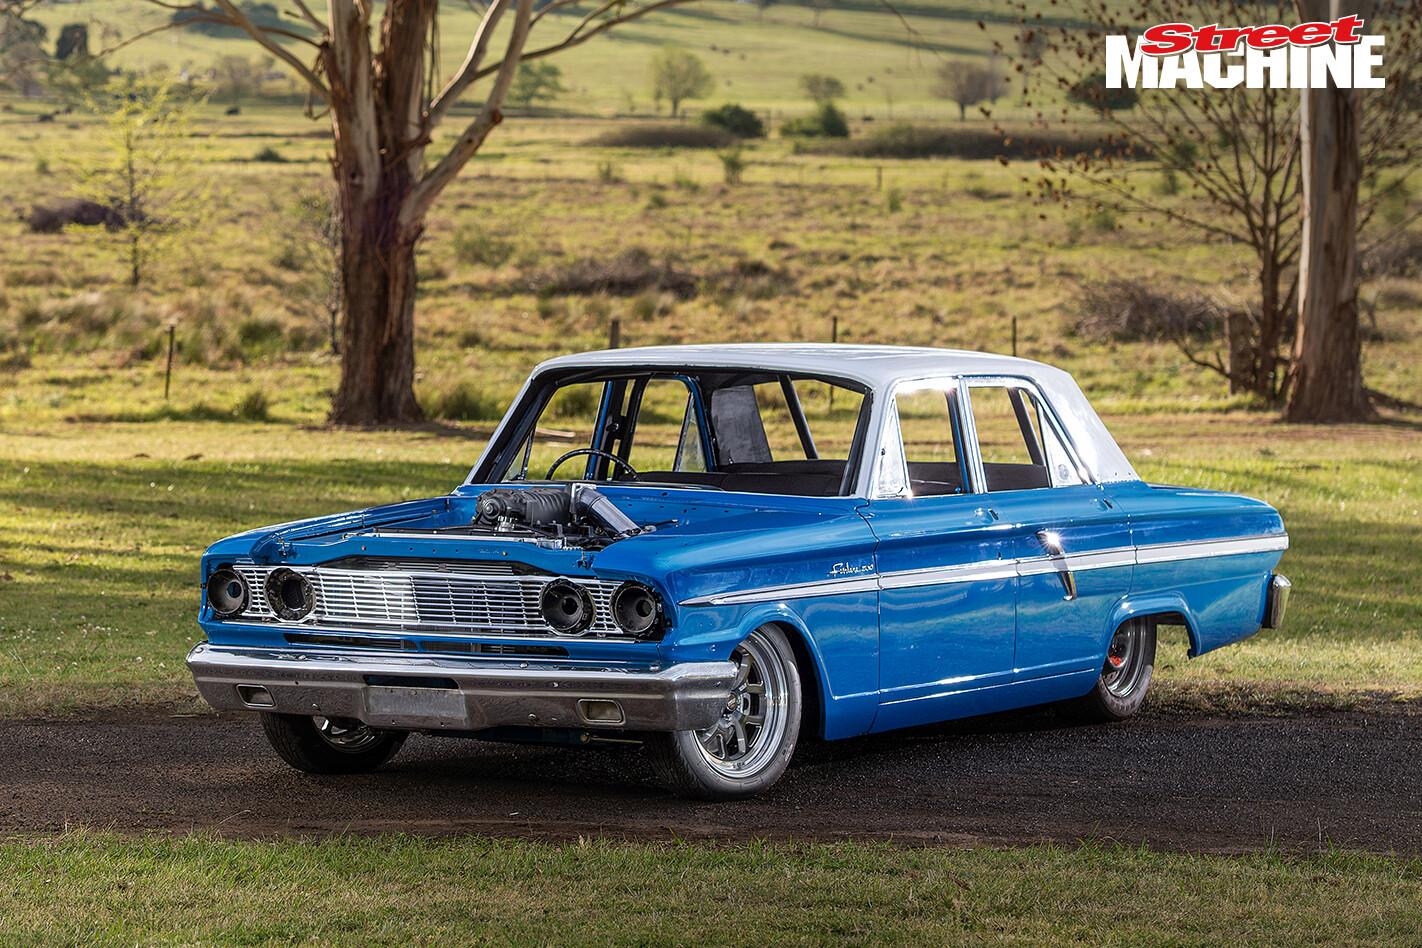 Ford Compact Fairlane V8 4